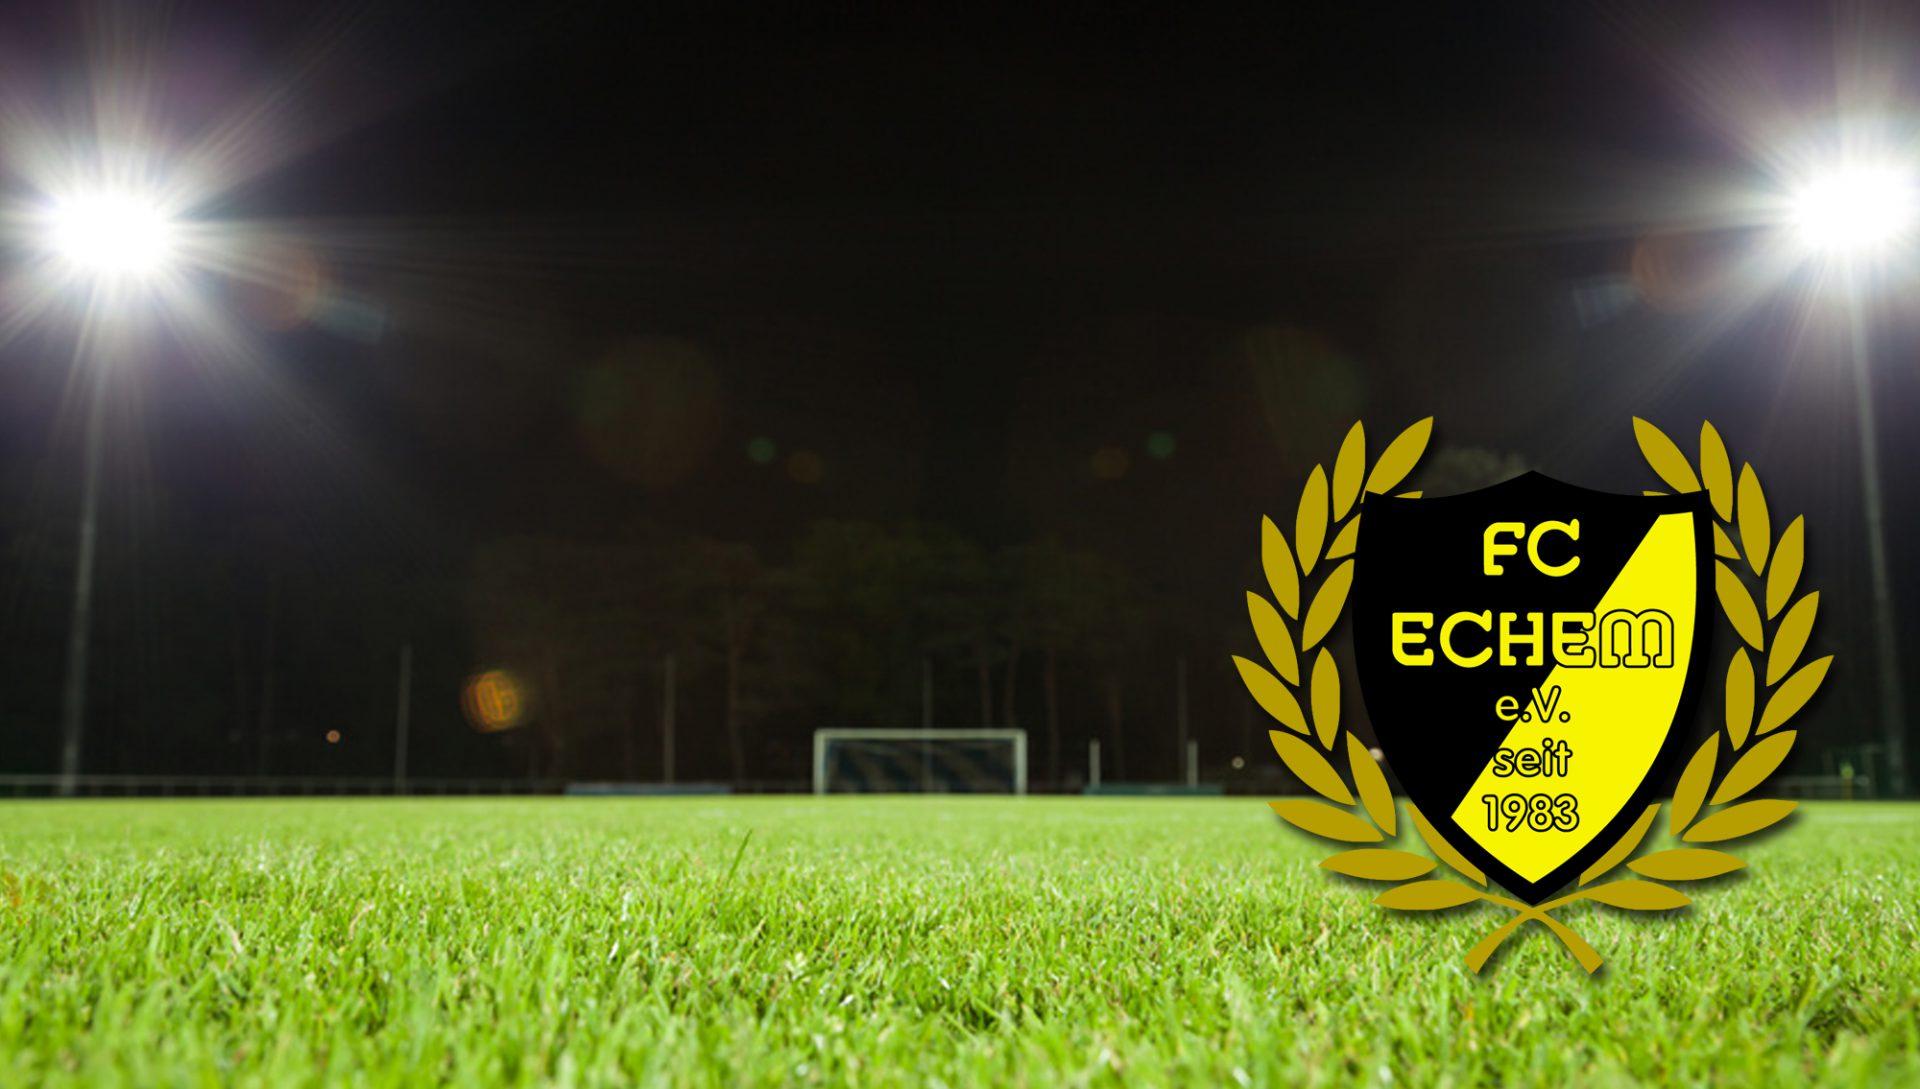 FC Echem e.V.